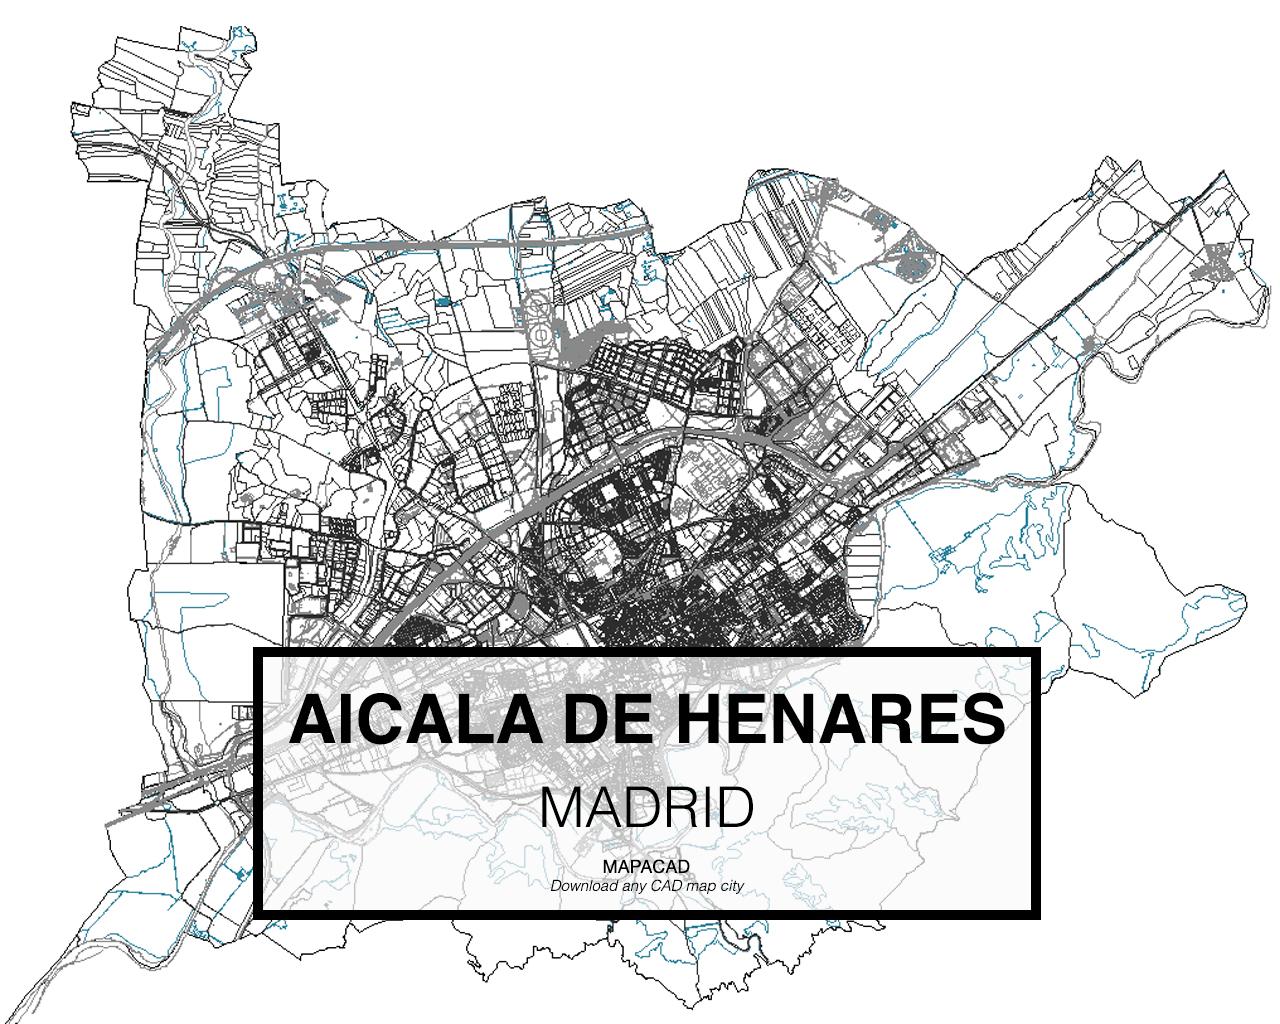 Madrid dwg mapacad Arquitectura alcala de henares